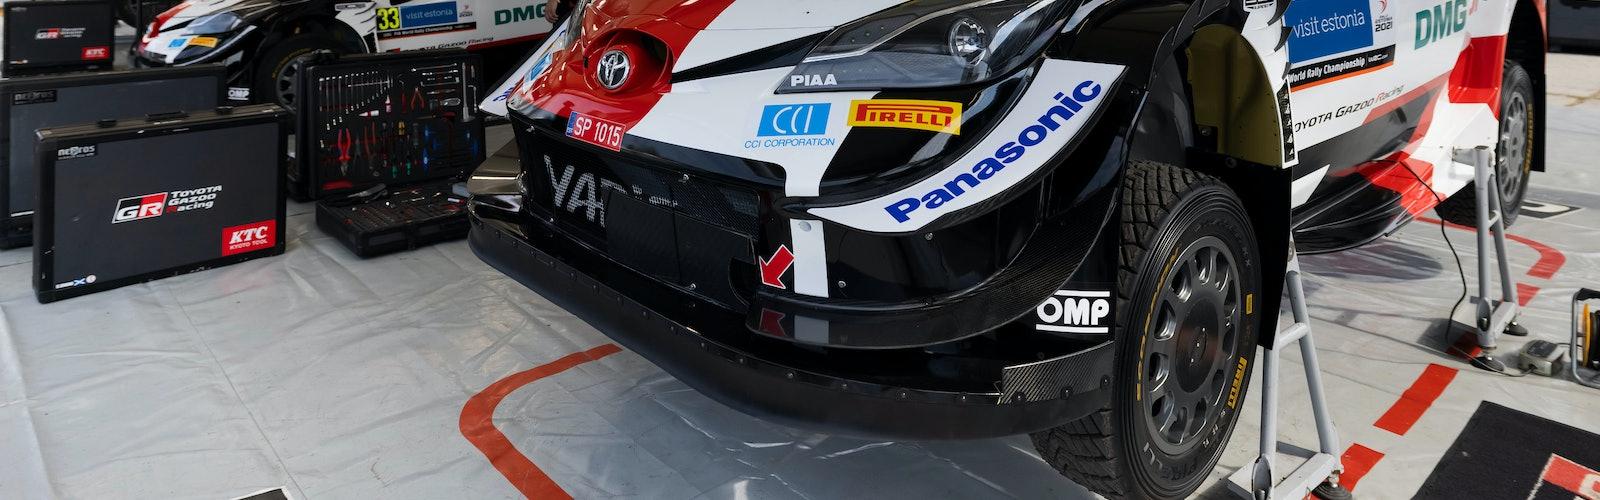 WRC_2021_Rd.7_030